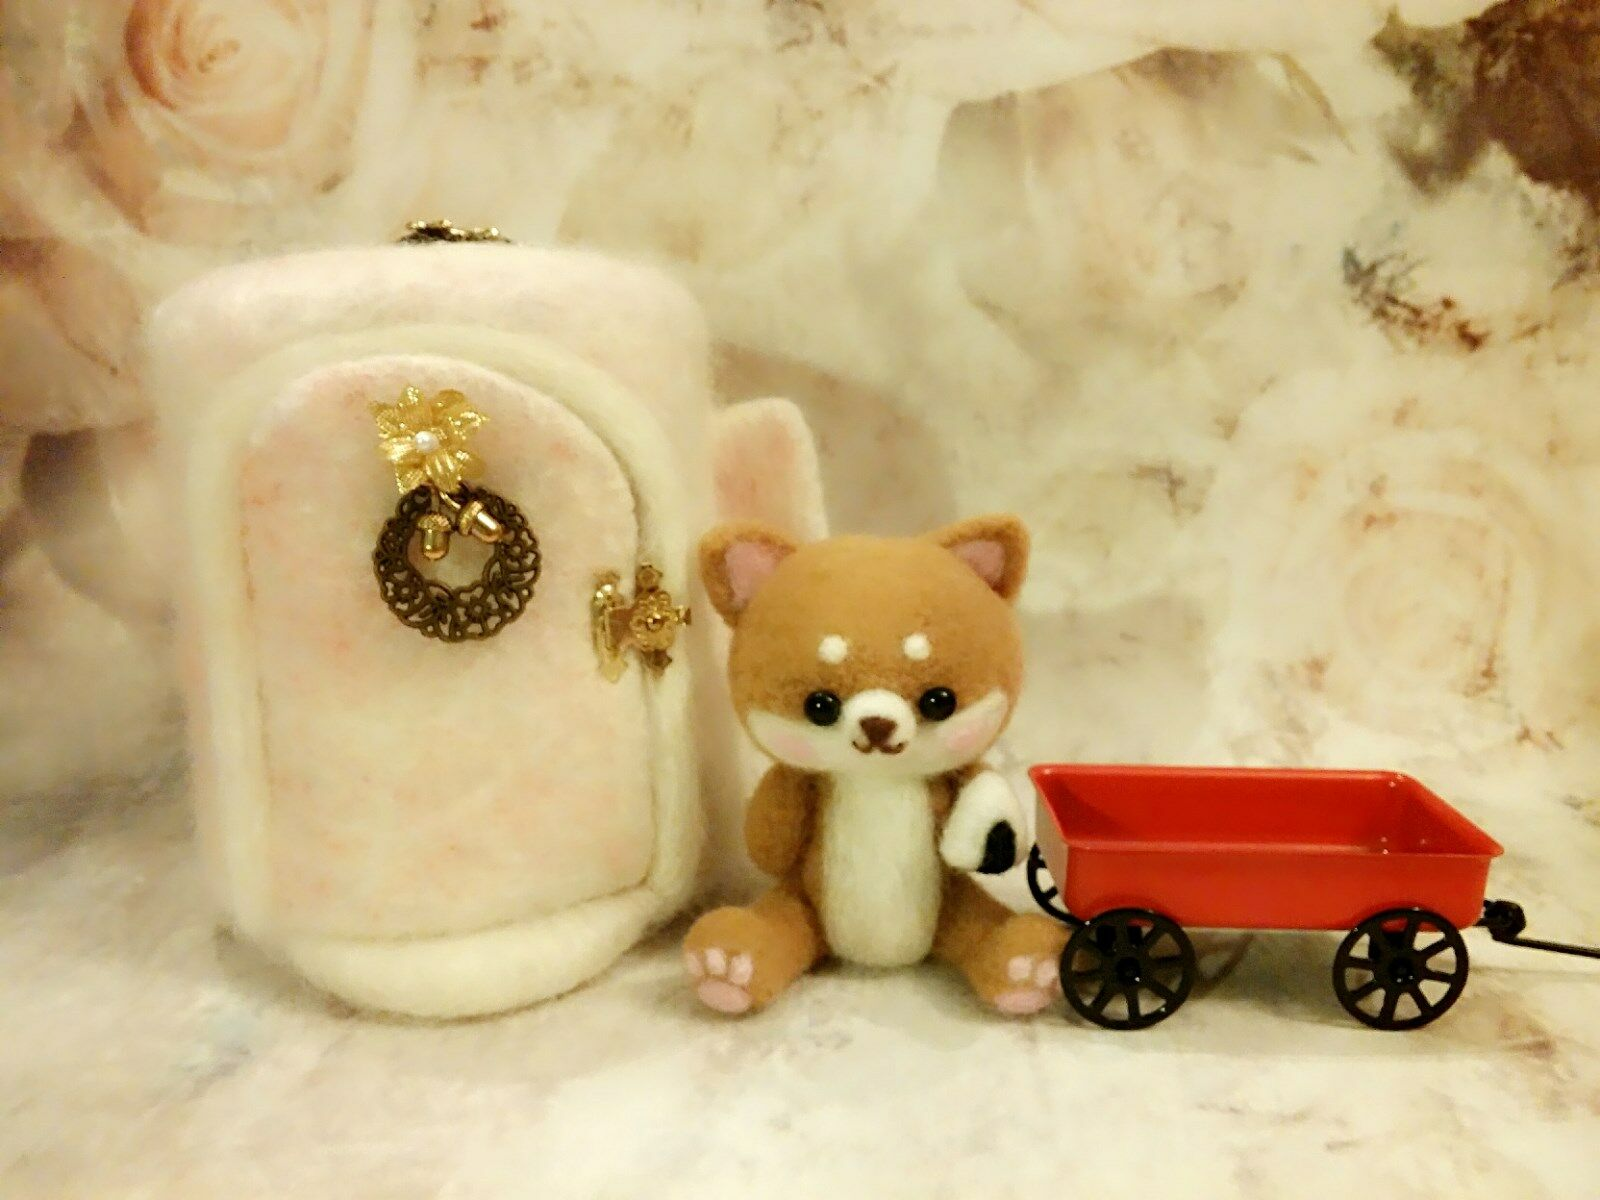 OOAK Handmade 5  Needle Felted Shiba Inu Puppy & House Set by Artist Scuznyuki